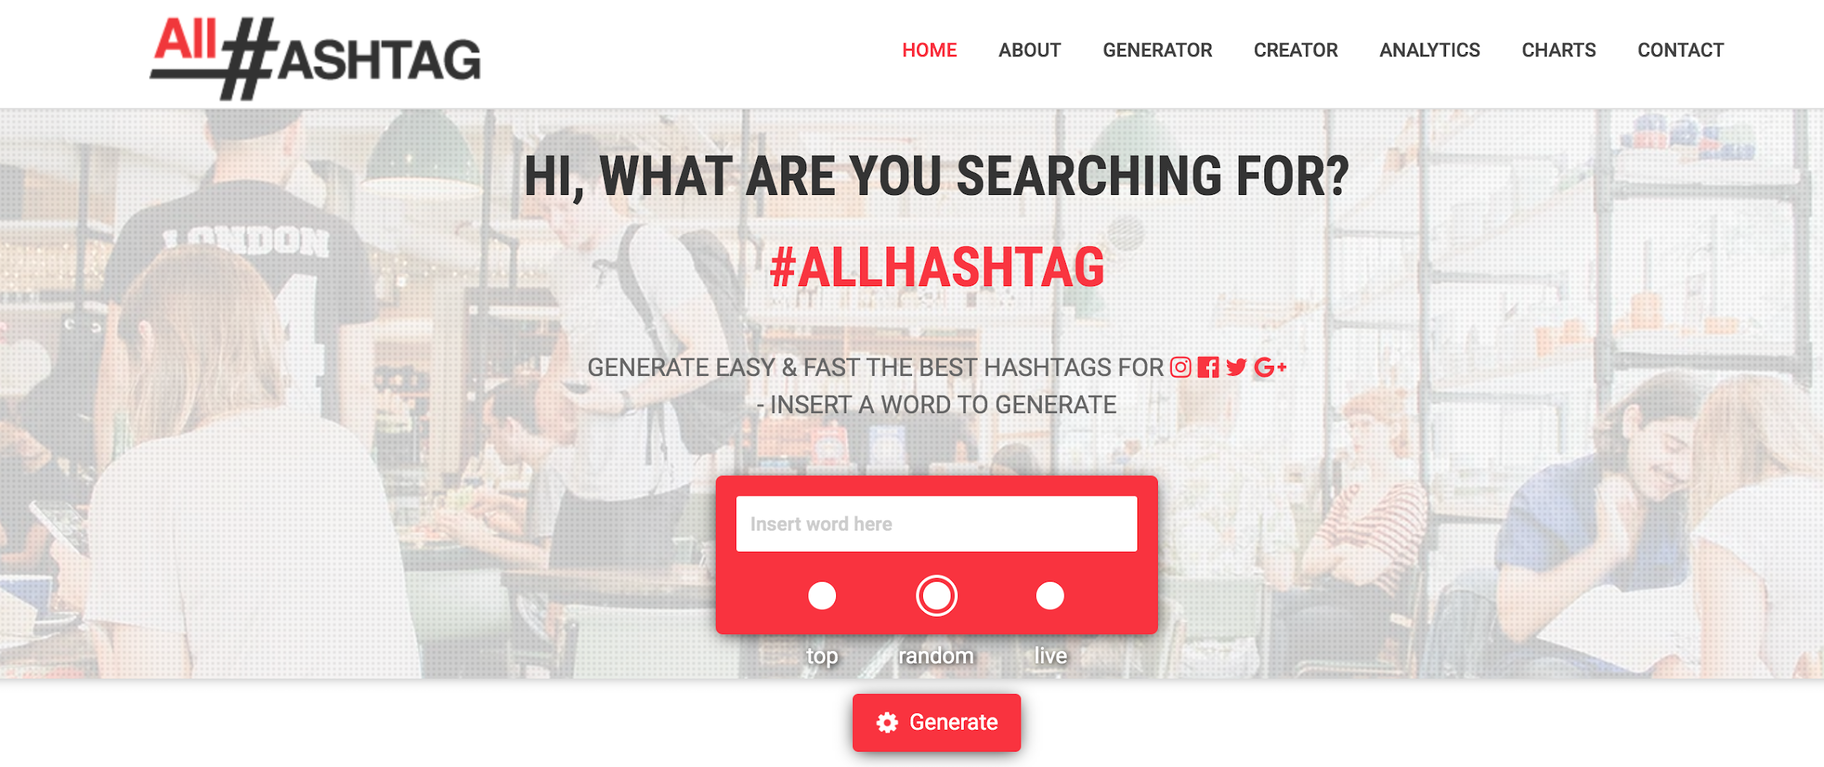 allhashtag